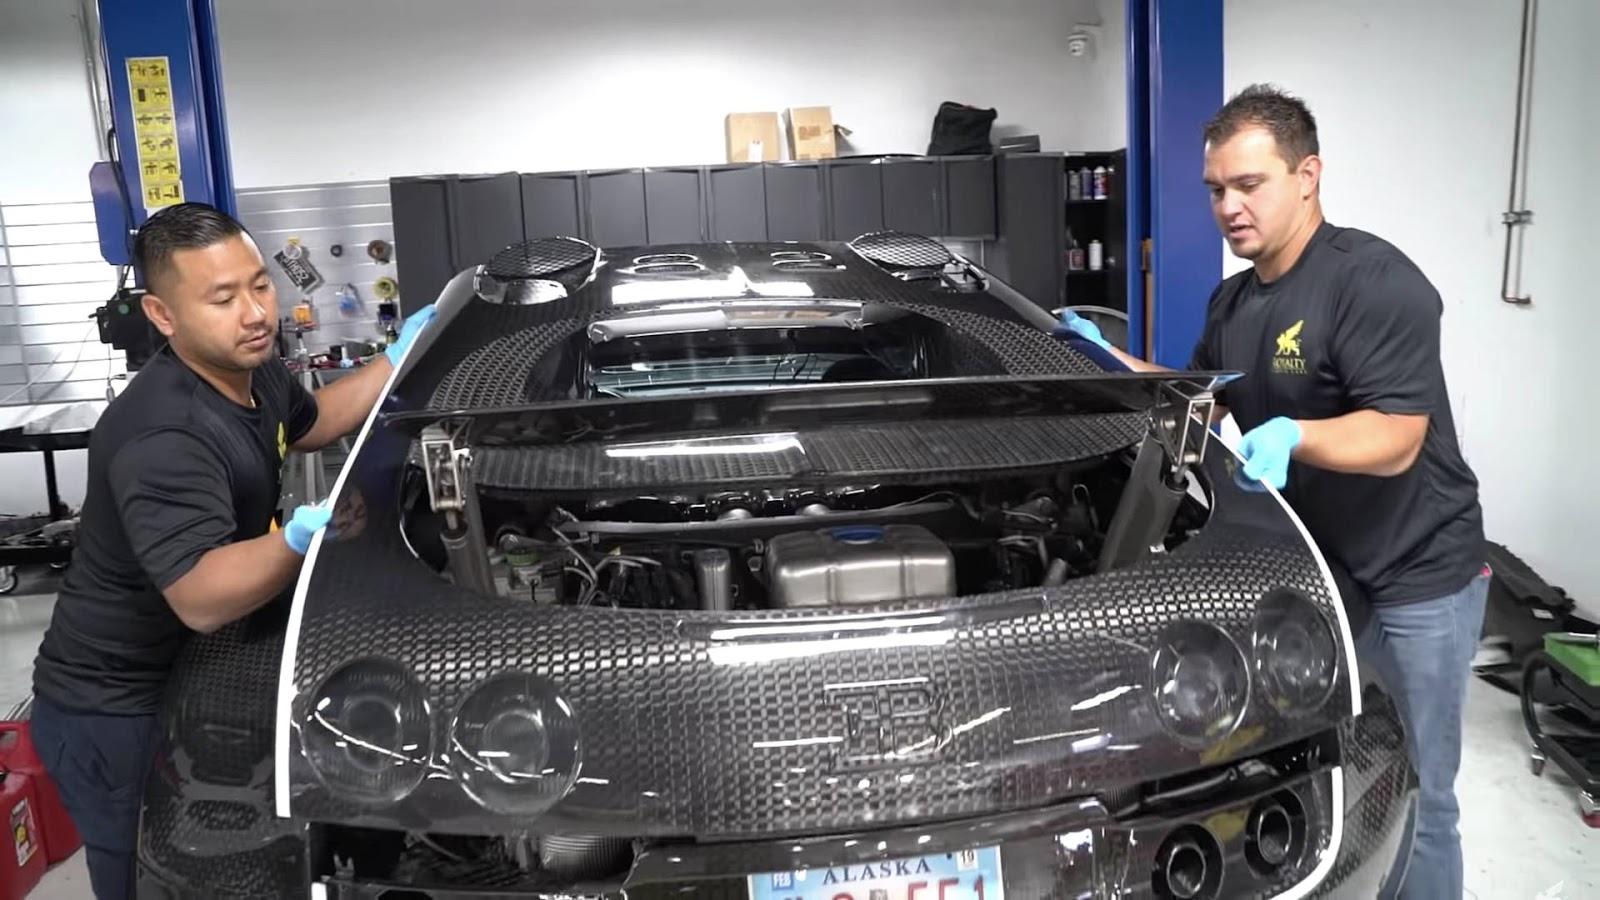 veyron2 Πόσο κοστίζει η αλλαγή λαδιών σε μια Bugatti; Bugatti, Bugatti Veyron, service, λάδια